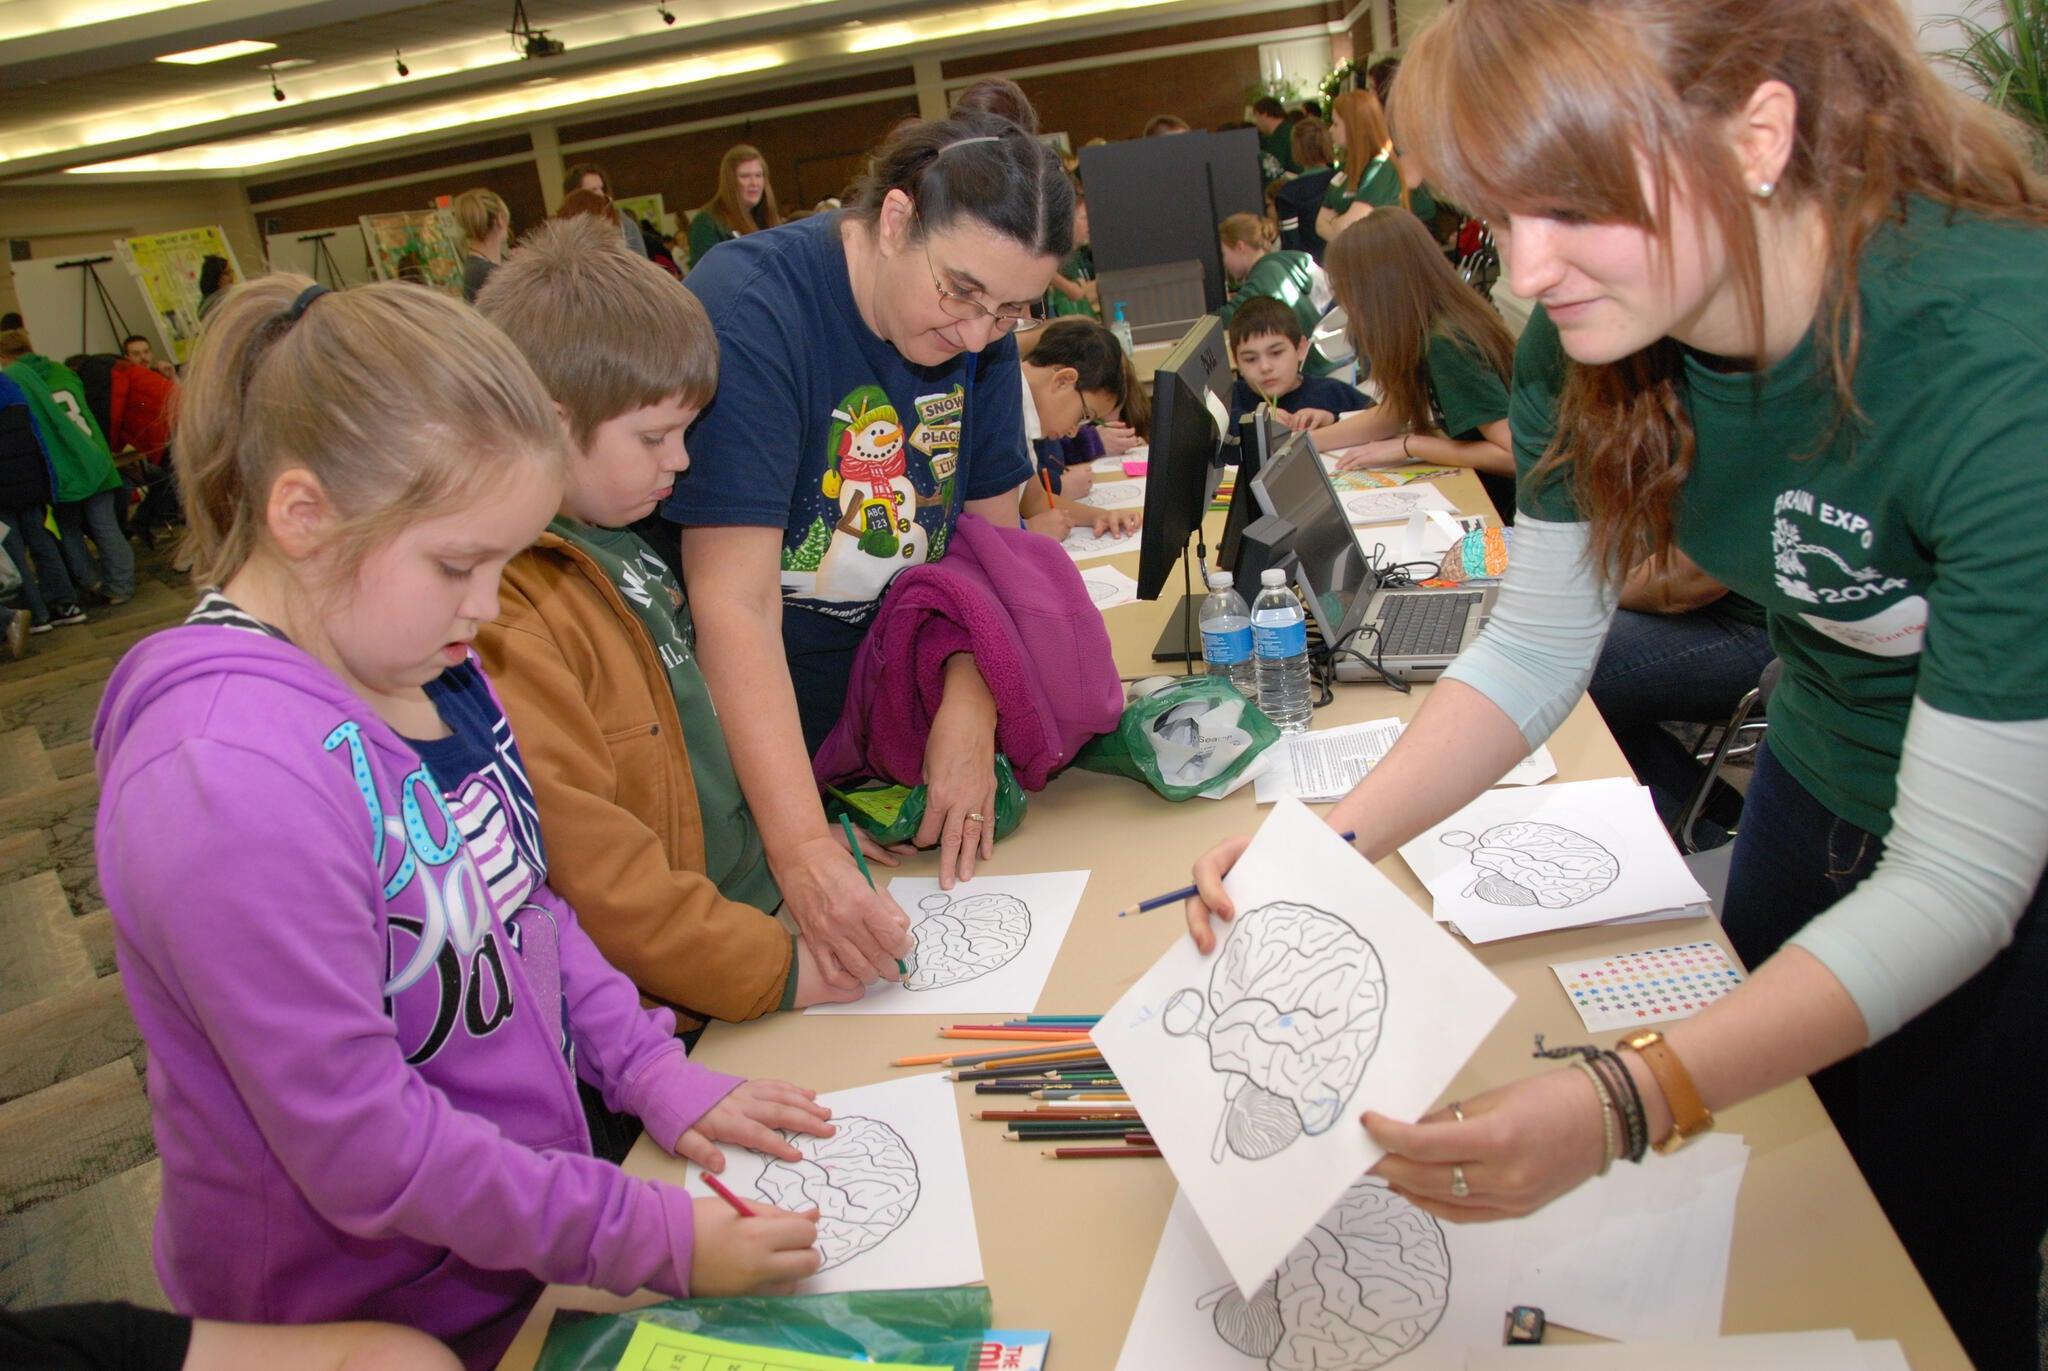 Annual Brain Expo helps children explore brain function with fun